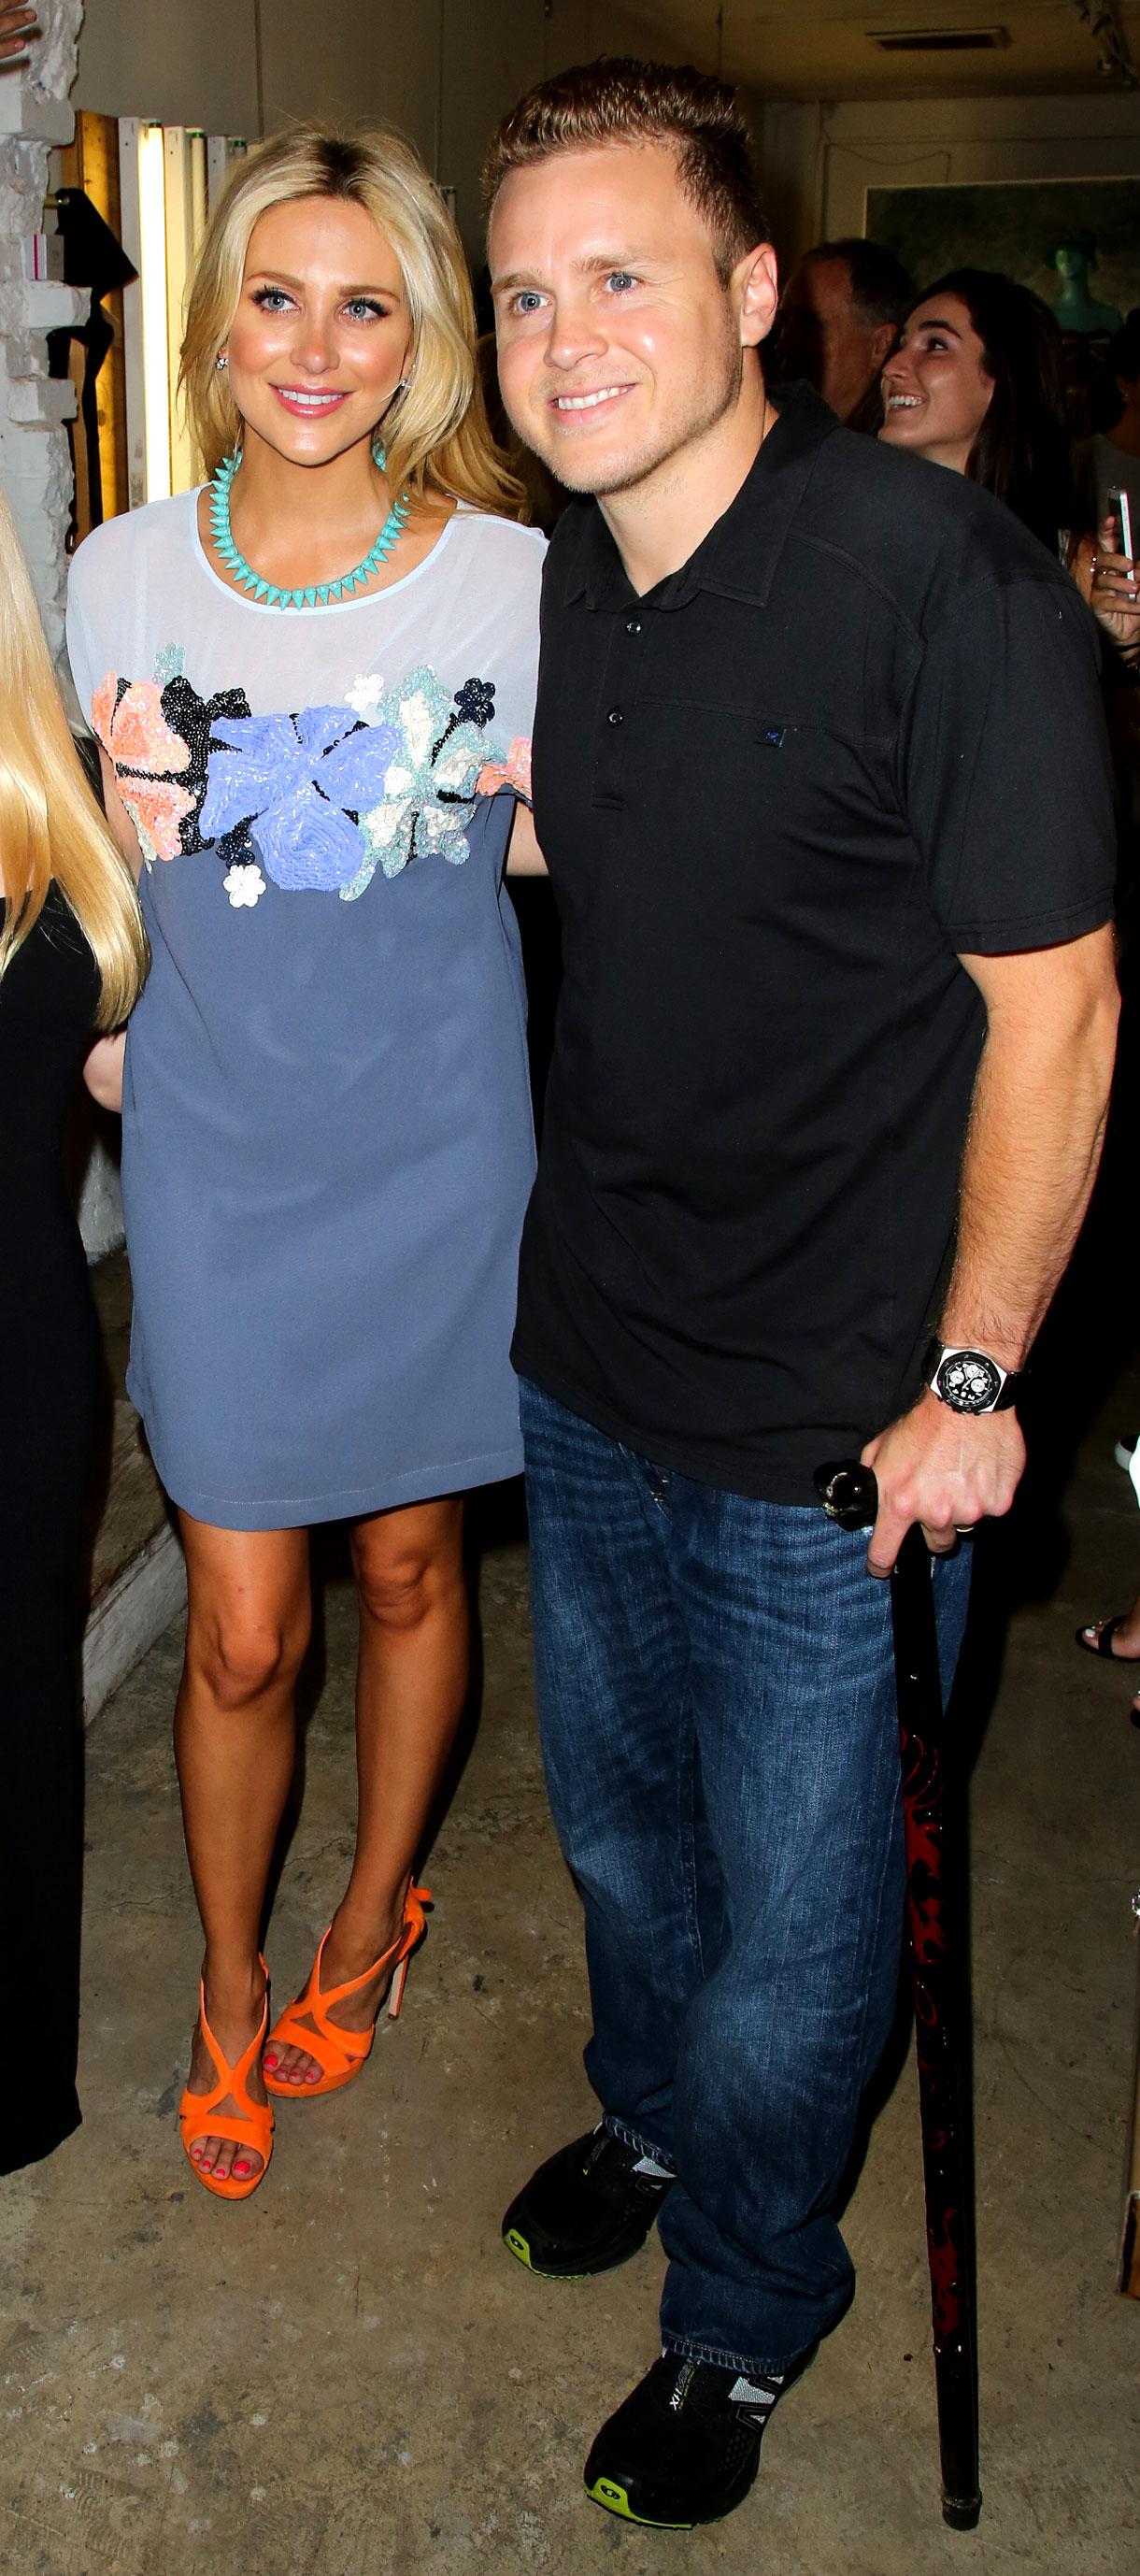 Stephanie Pratt Shades Spencer Pratt - Stephanie Pratt and Spencer Pratt attend the US Launch of MeMe London at DiLascia on July 28, 2015 in Los Angeles, California.